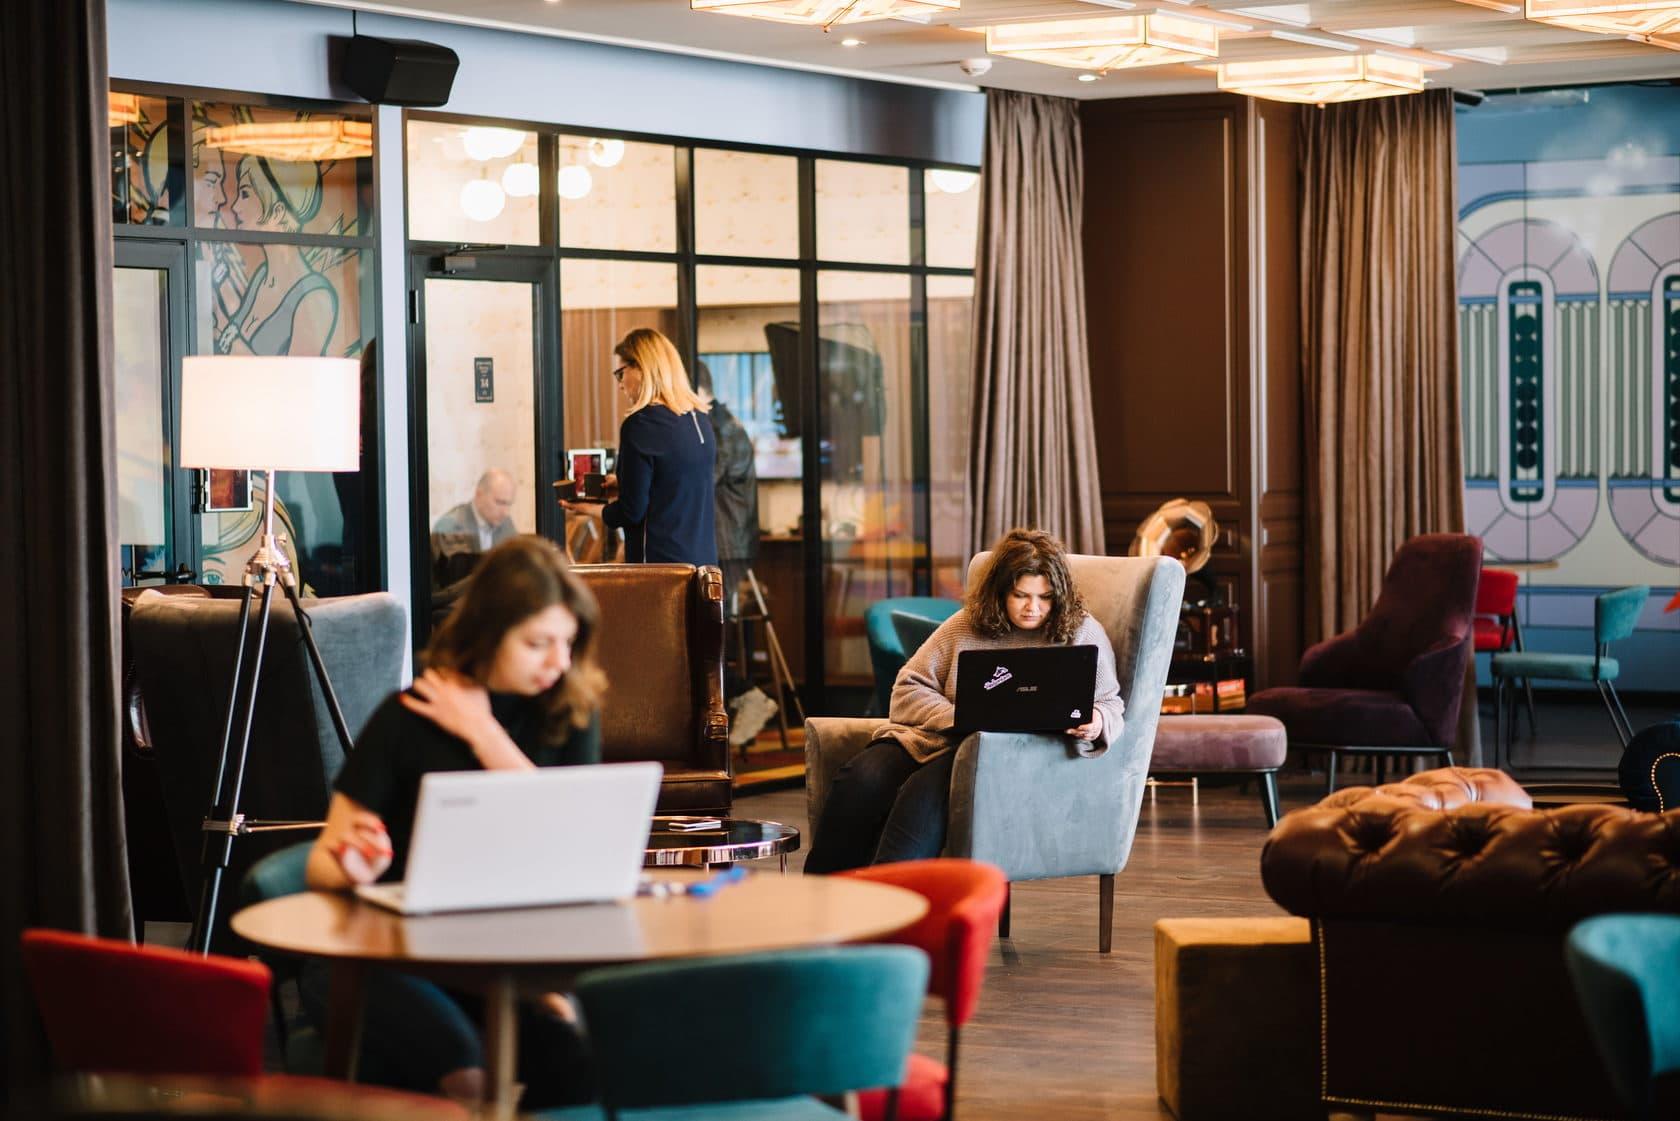 Як Work From Home трансформував готелі в офіси